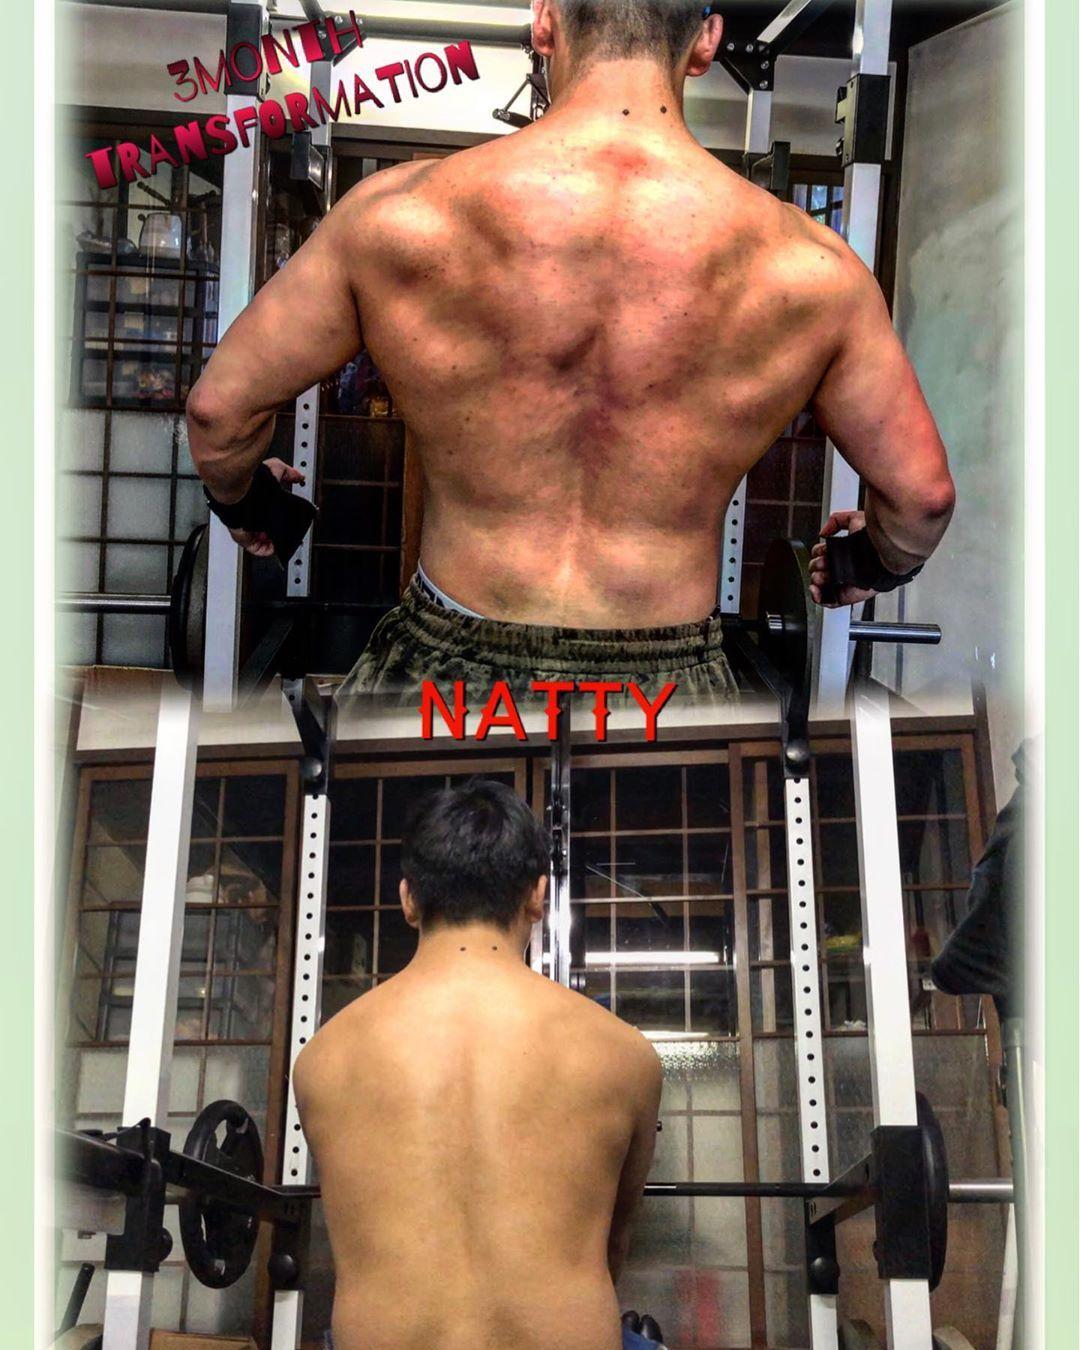 3months transformation. #fitnessmotivation #fitness #physique #japanfitness #natty...